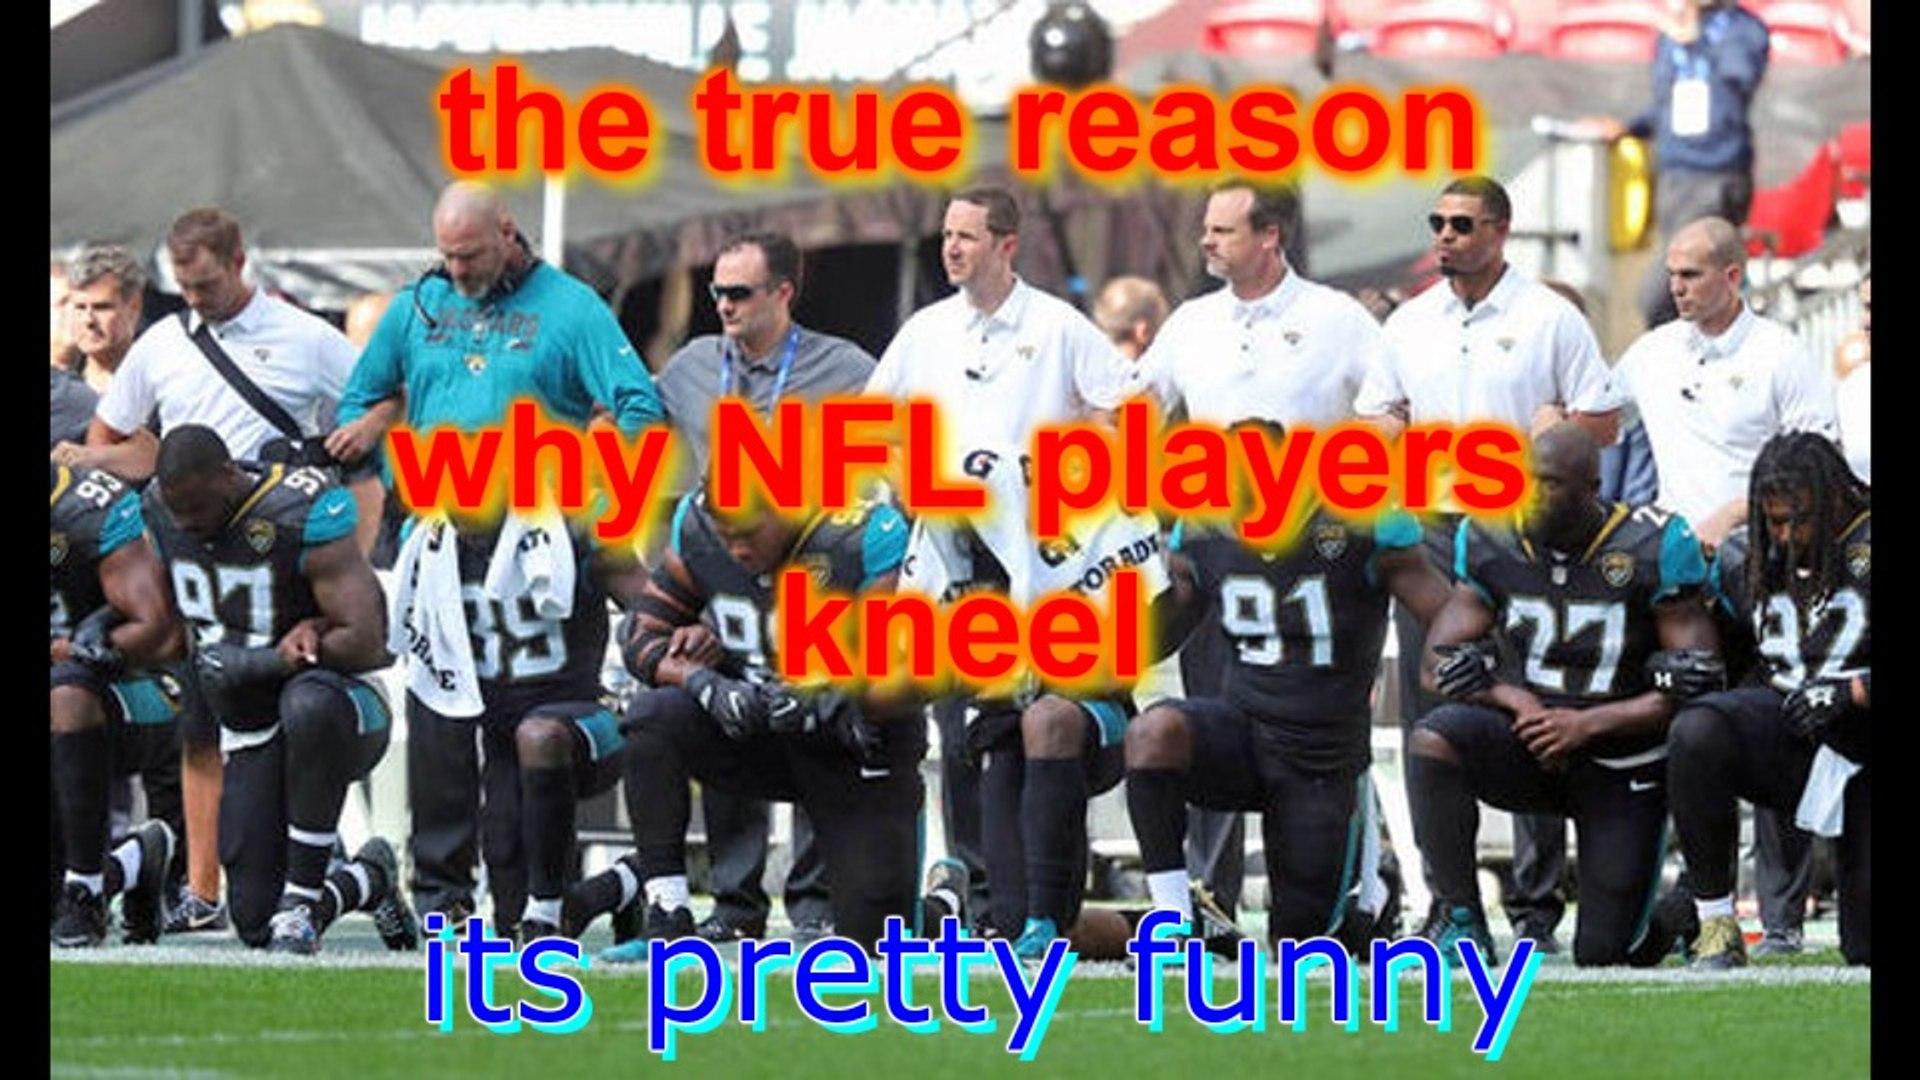 the true reason NFL players kneel